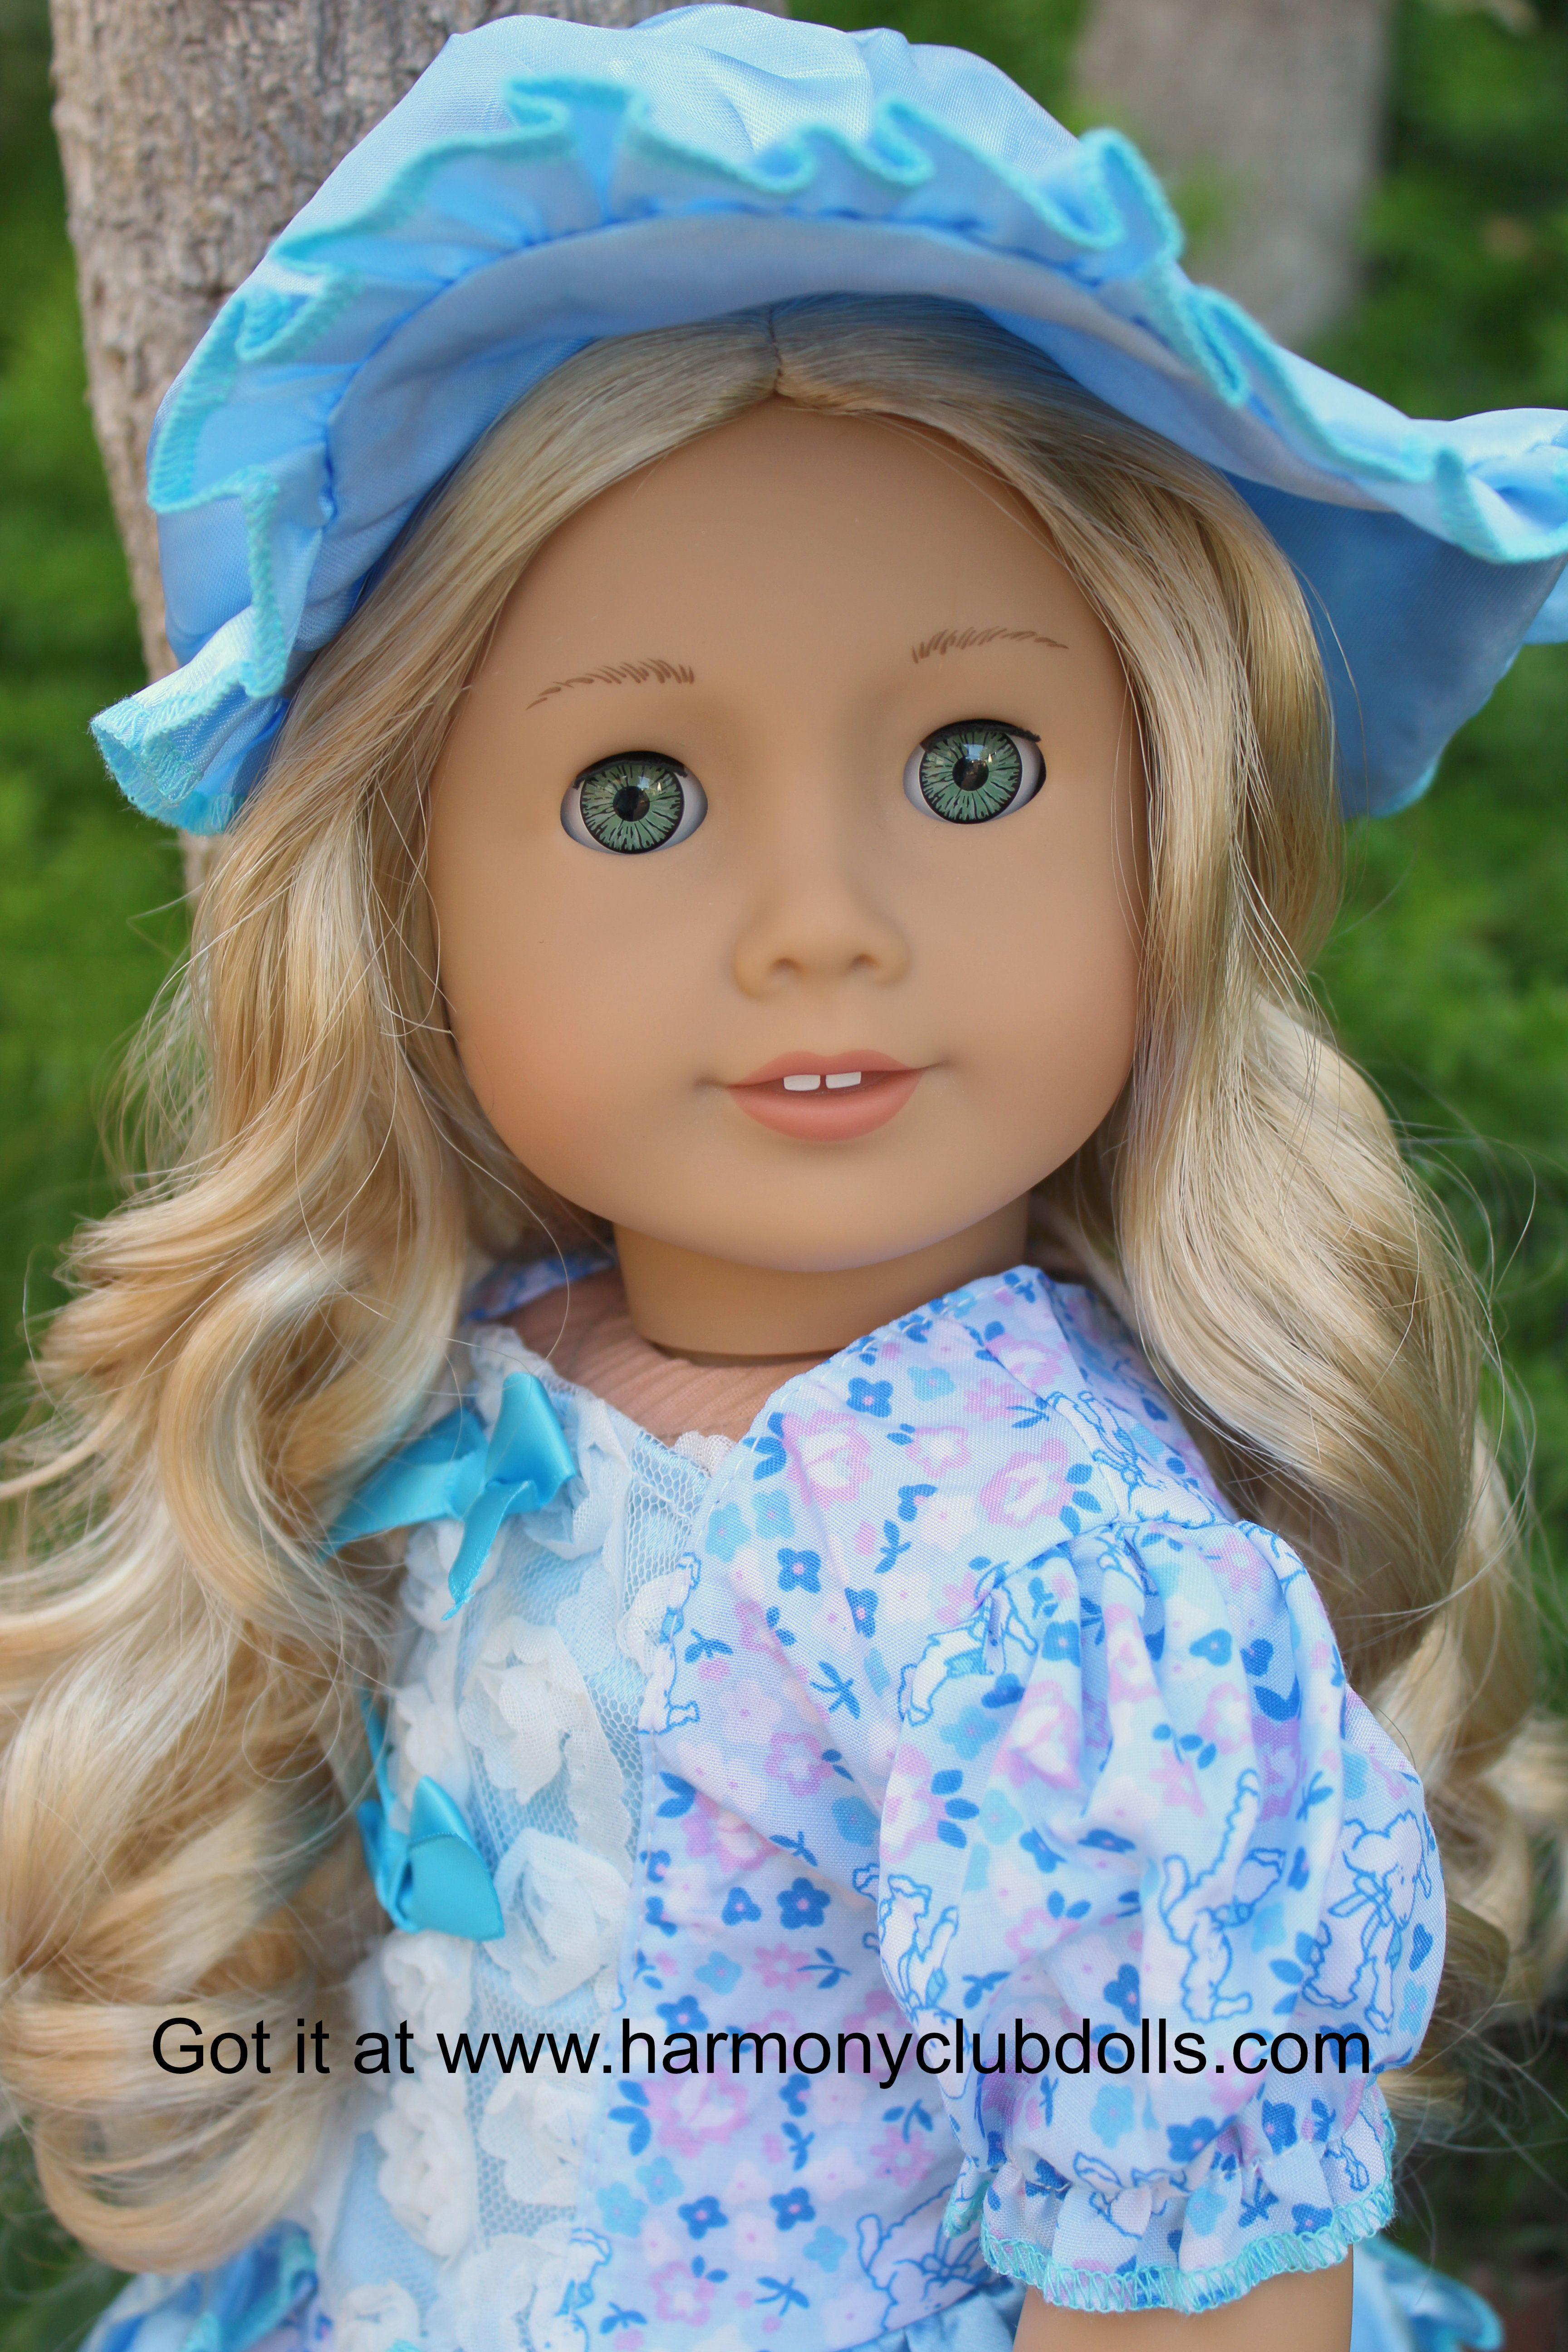 "HARMONY CLUB DOLLS 18"" Doll clothes bo peep dress www.harmonyclubdolls.com"